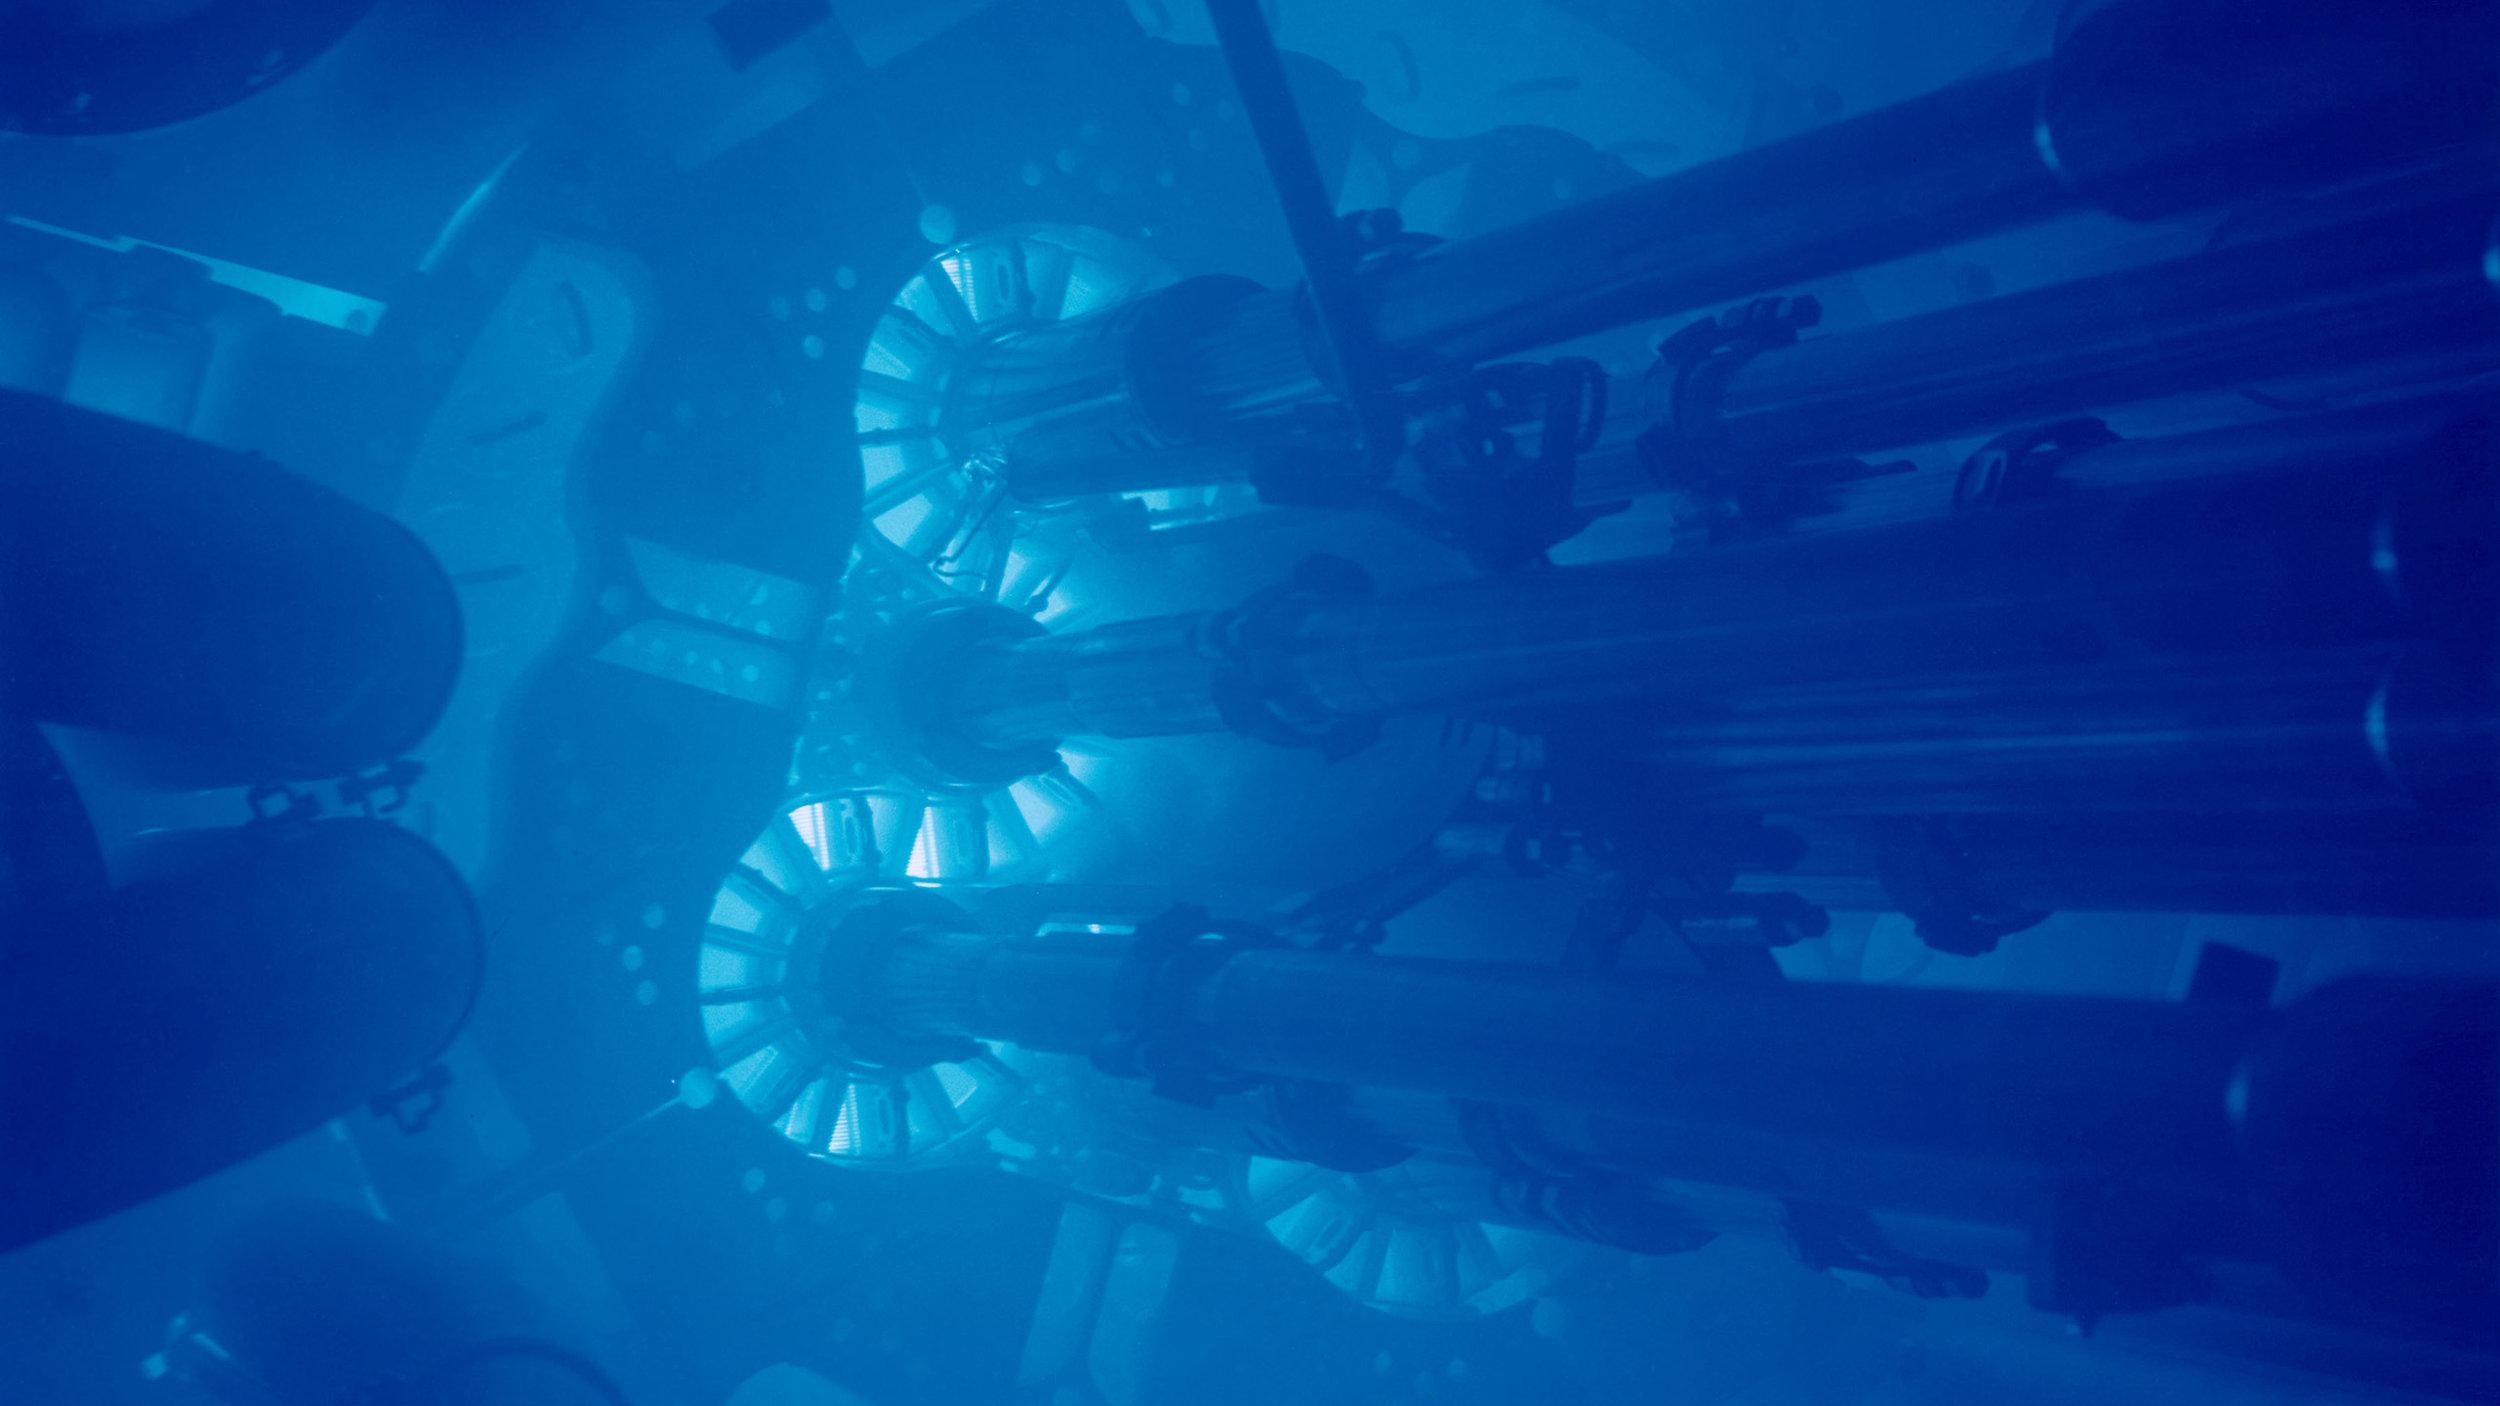 Image credit: Argonne National Laboratory